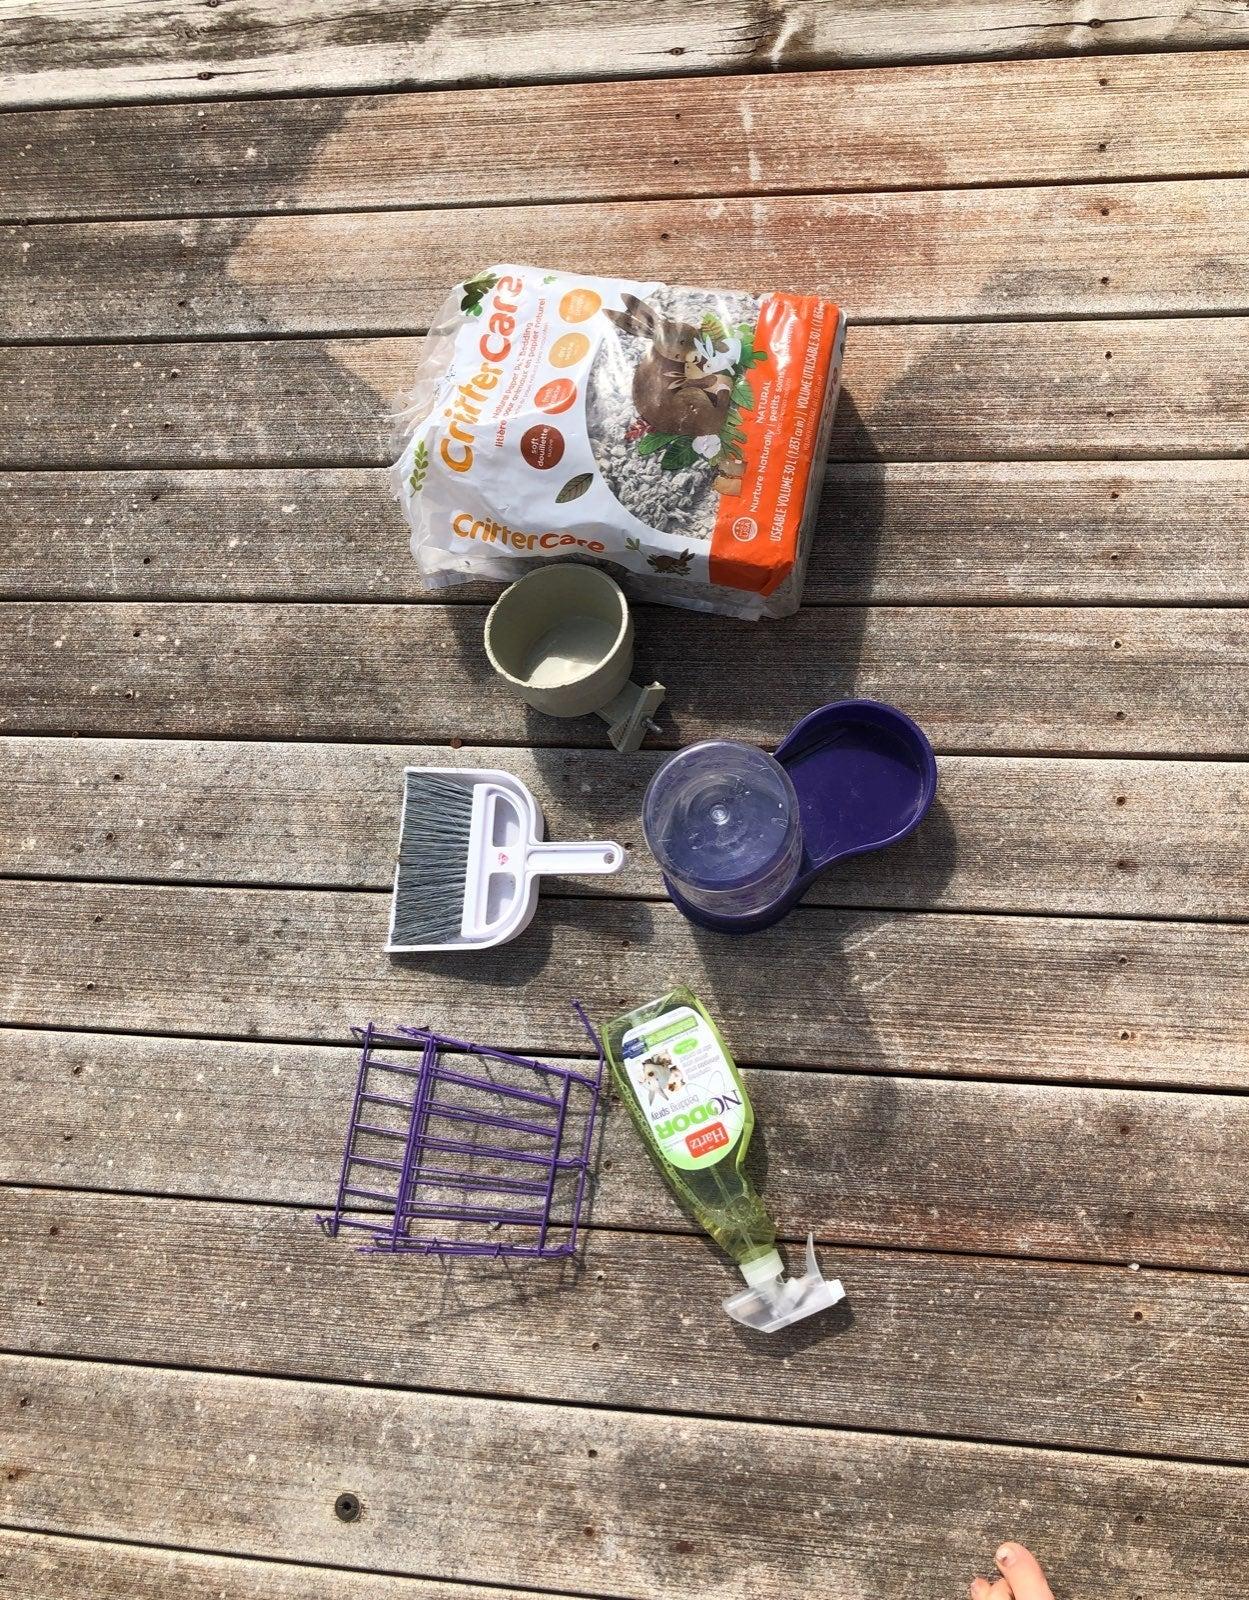 Bunny supplies